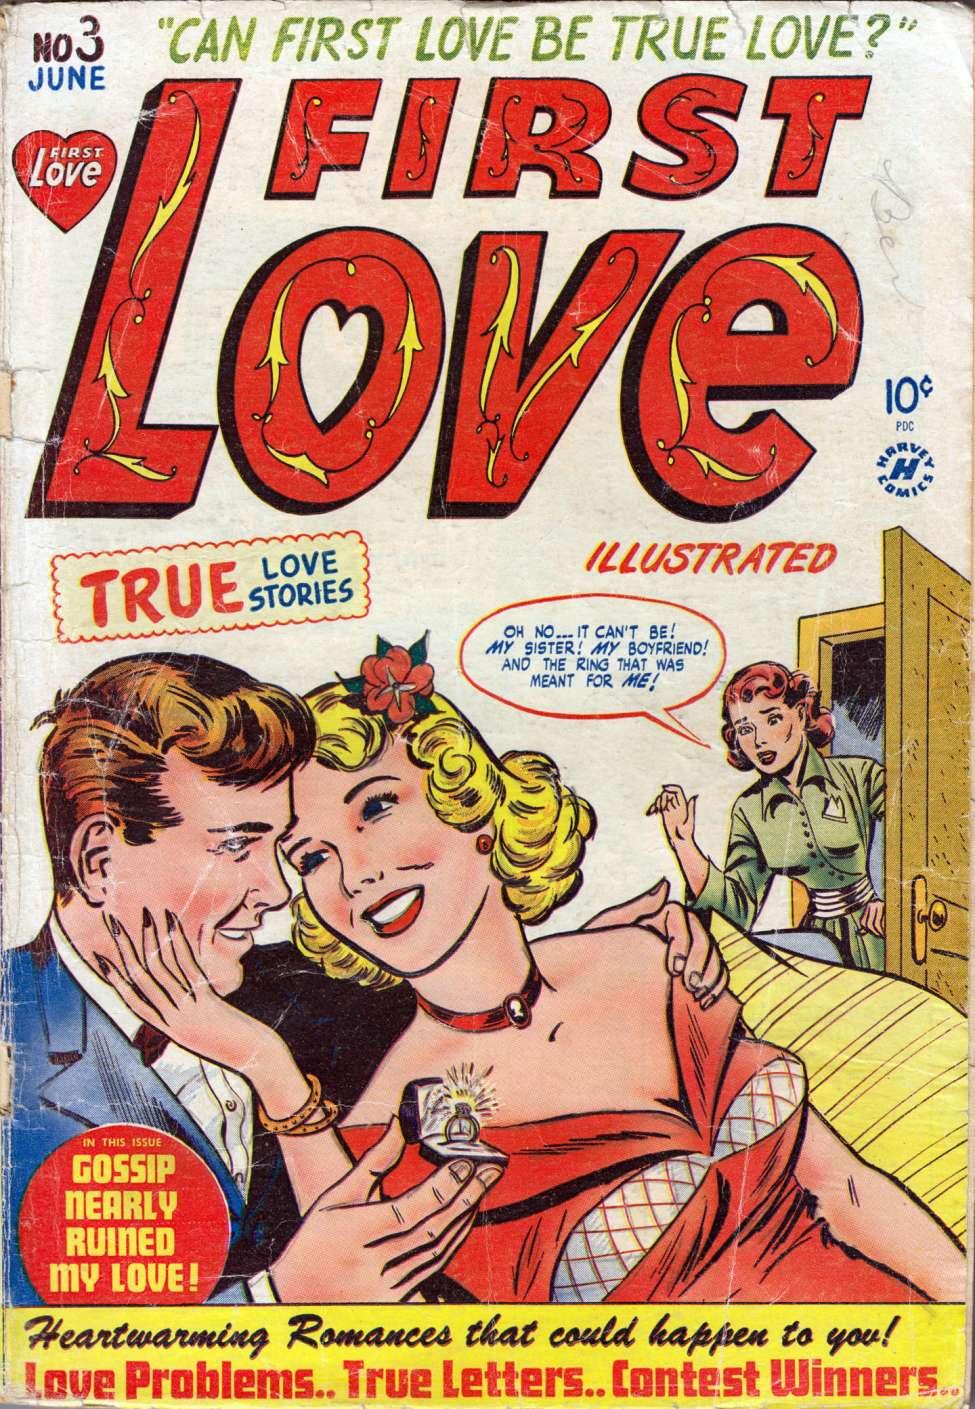 First Love Illustrated #3, Harvey Comics